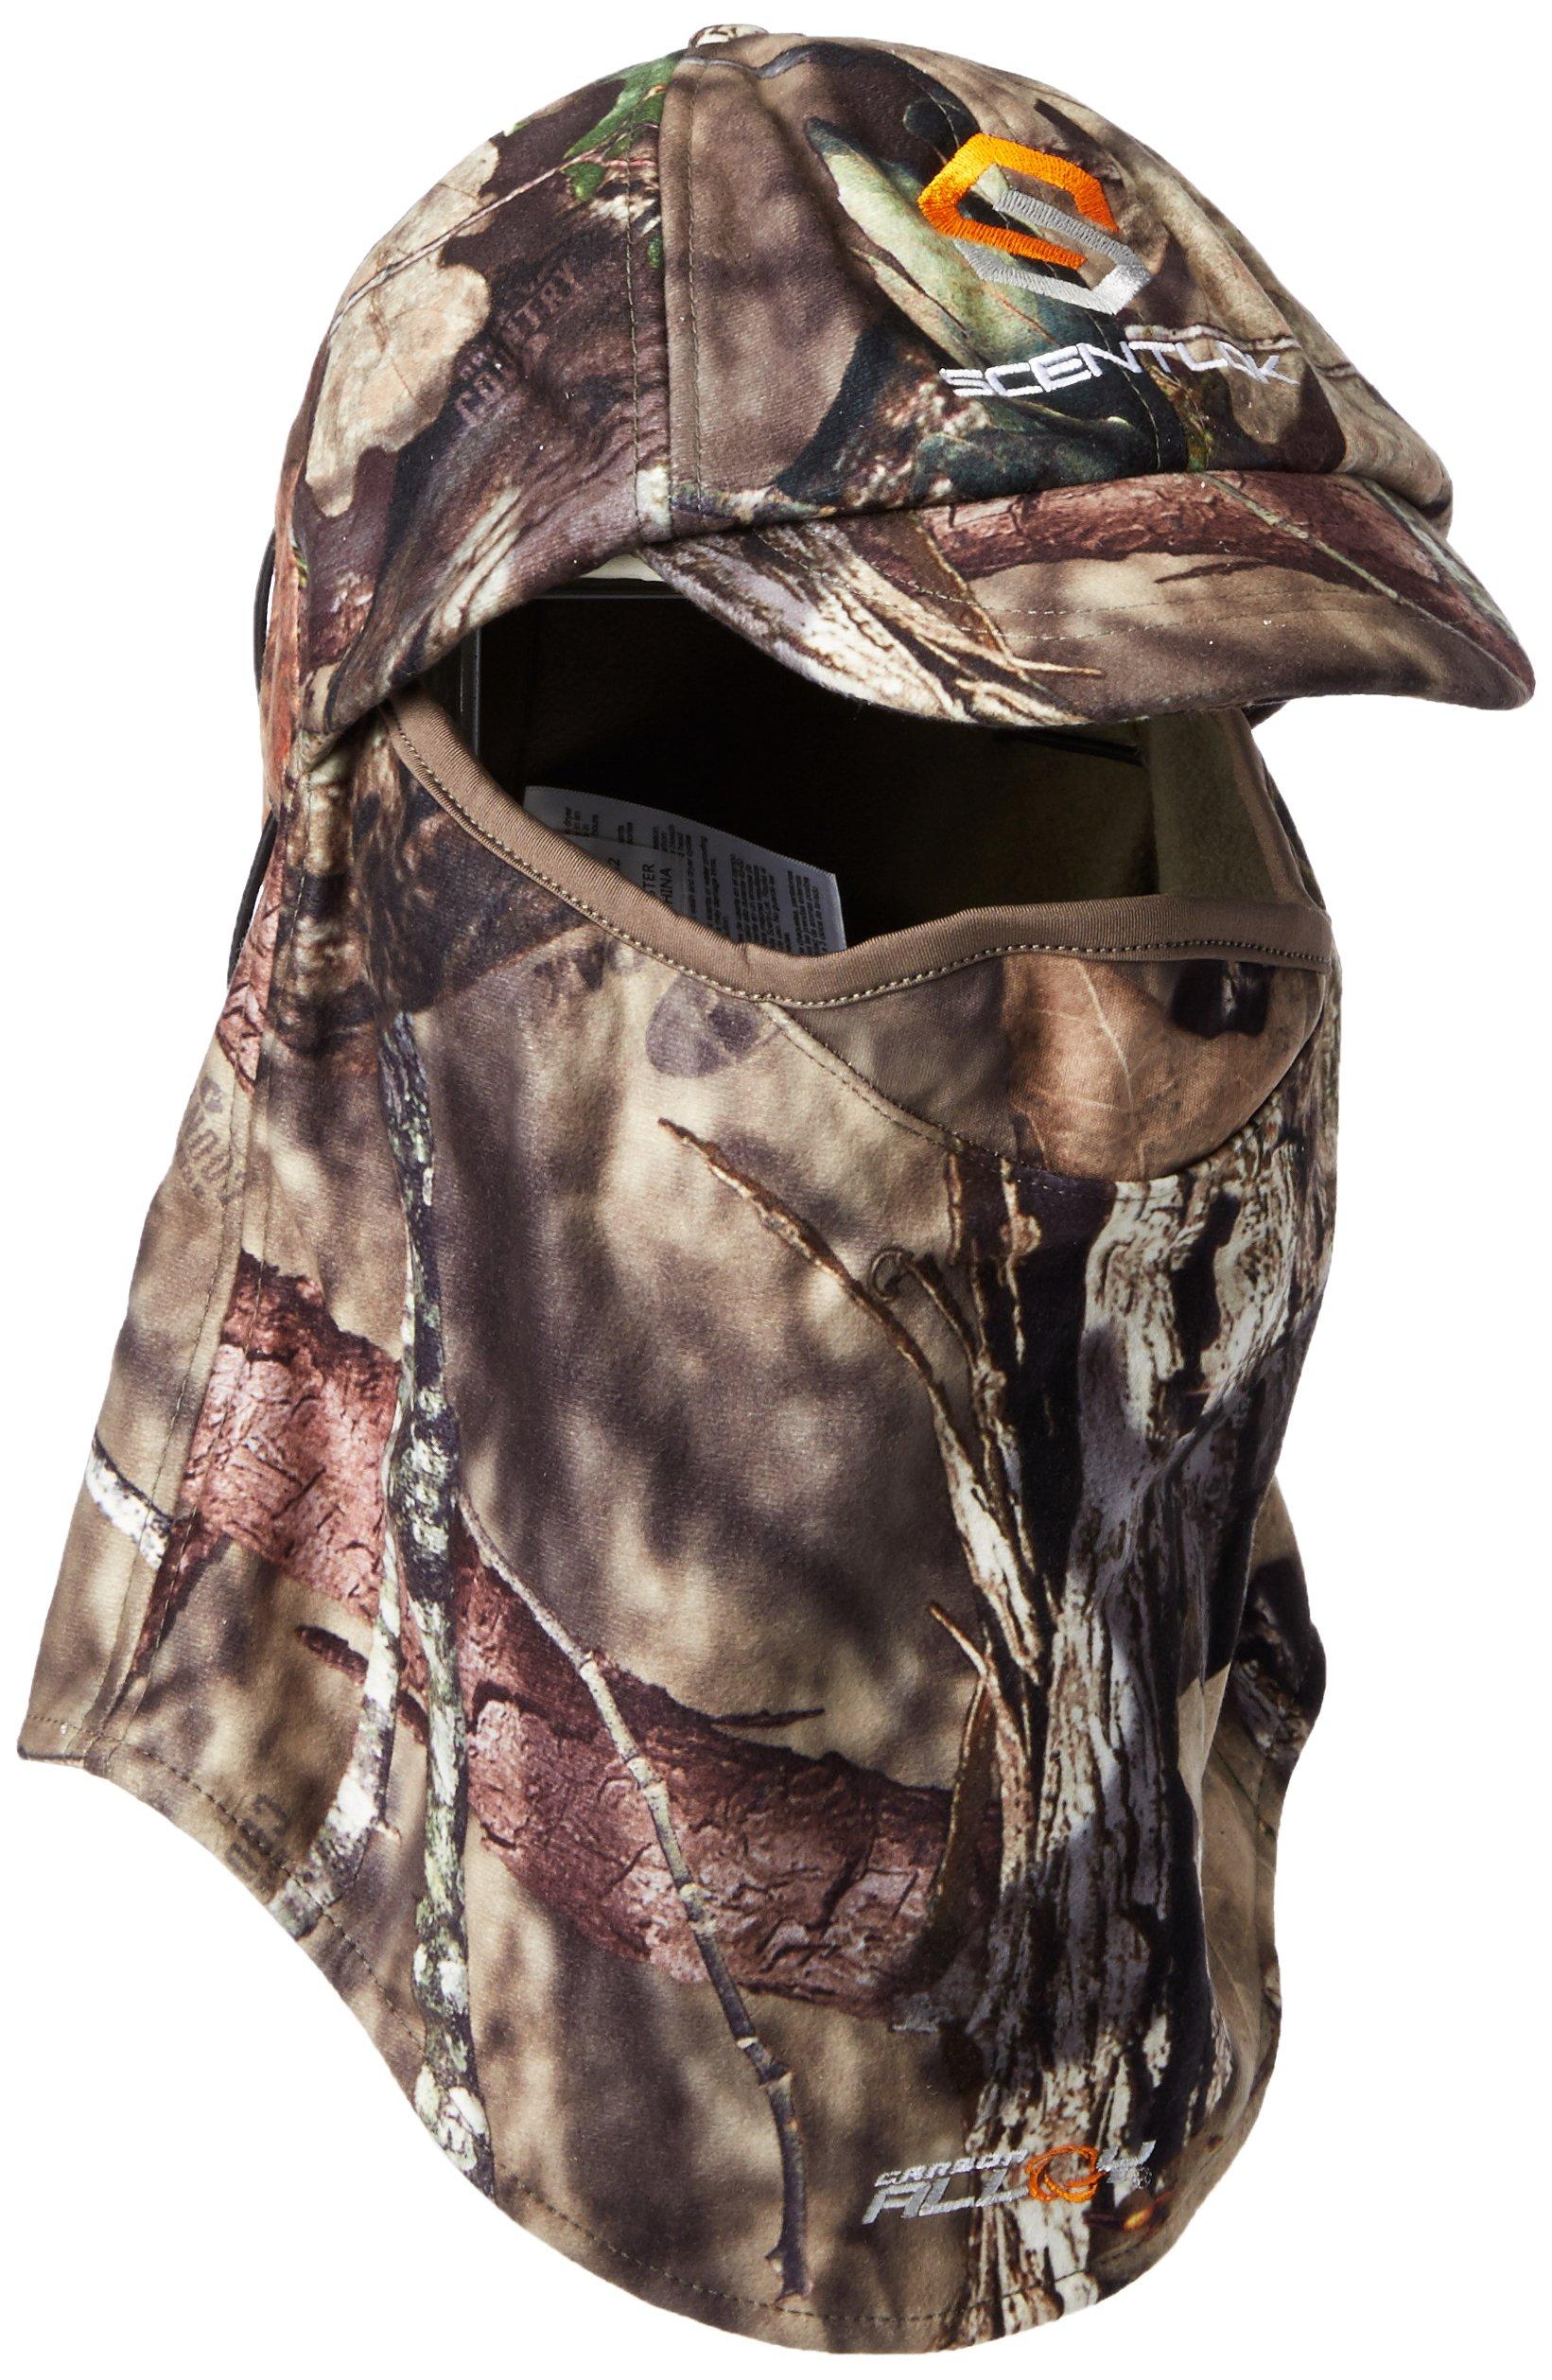 Scentlok Men's Savanna Ultimate Lightweight Headcover, Realtree Xtra, One Size